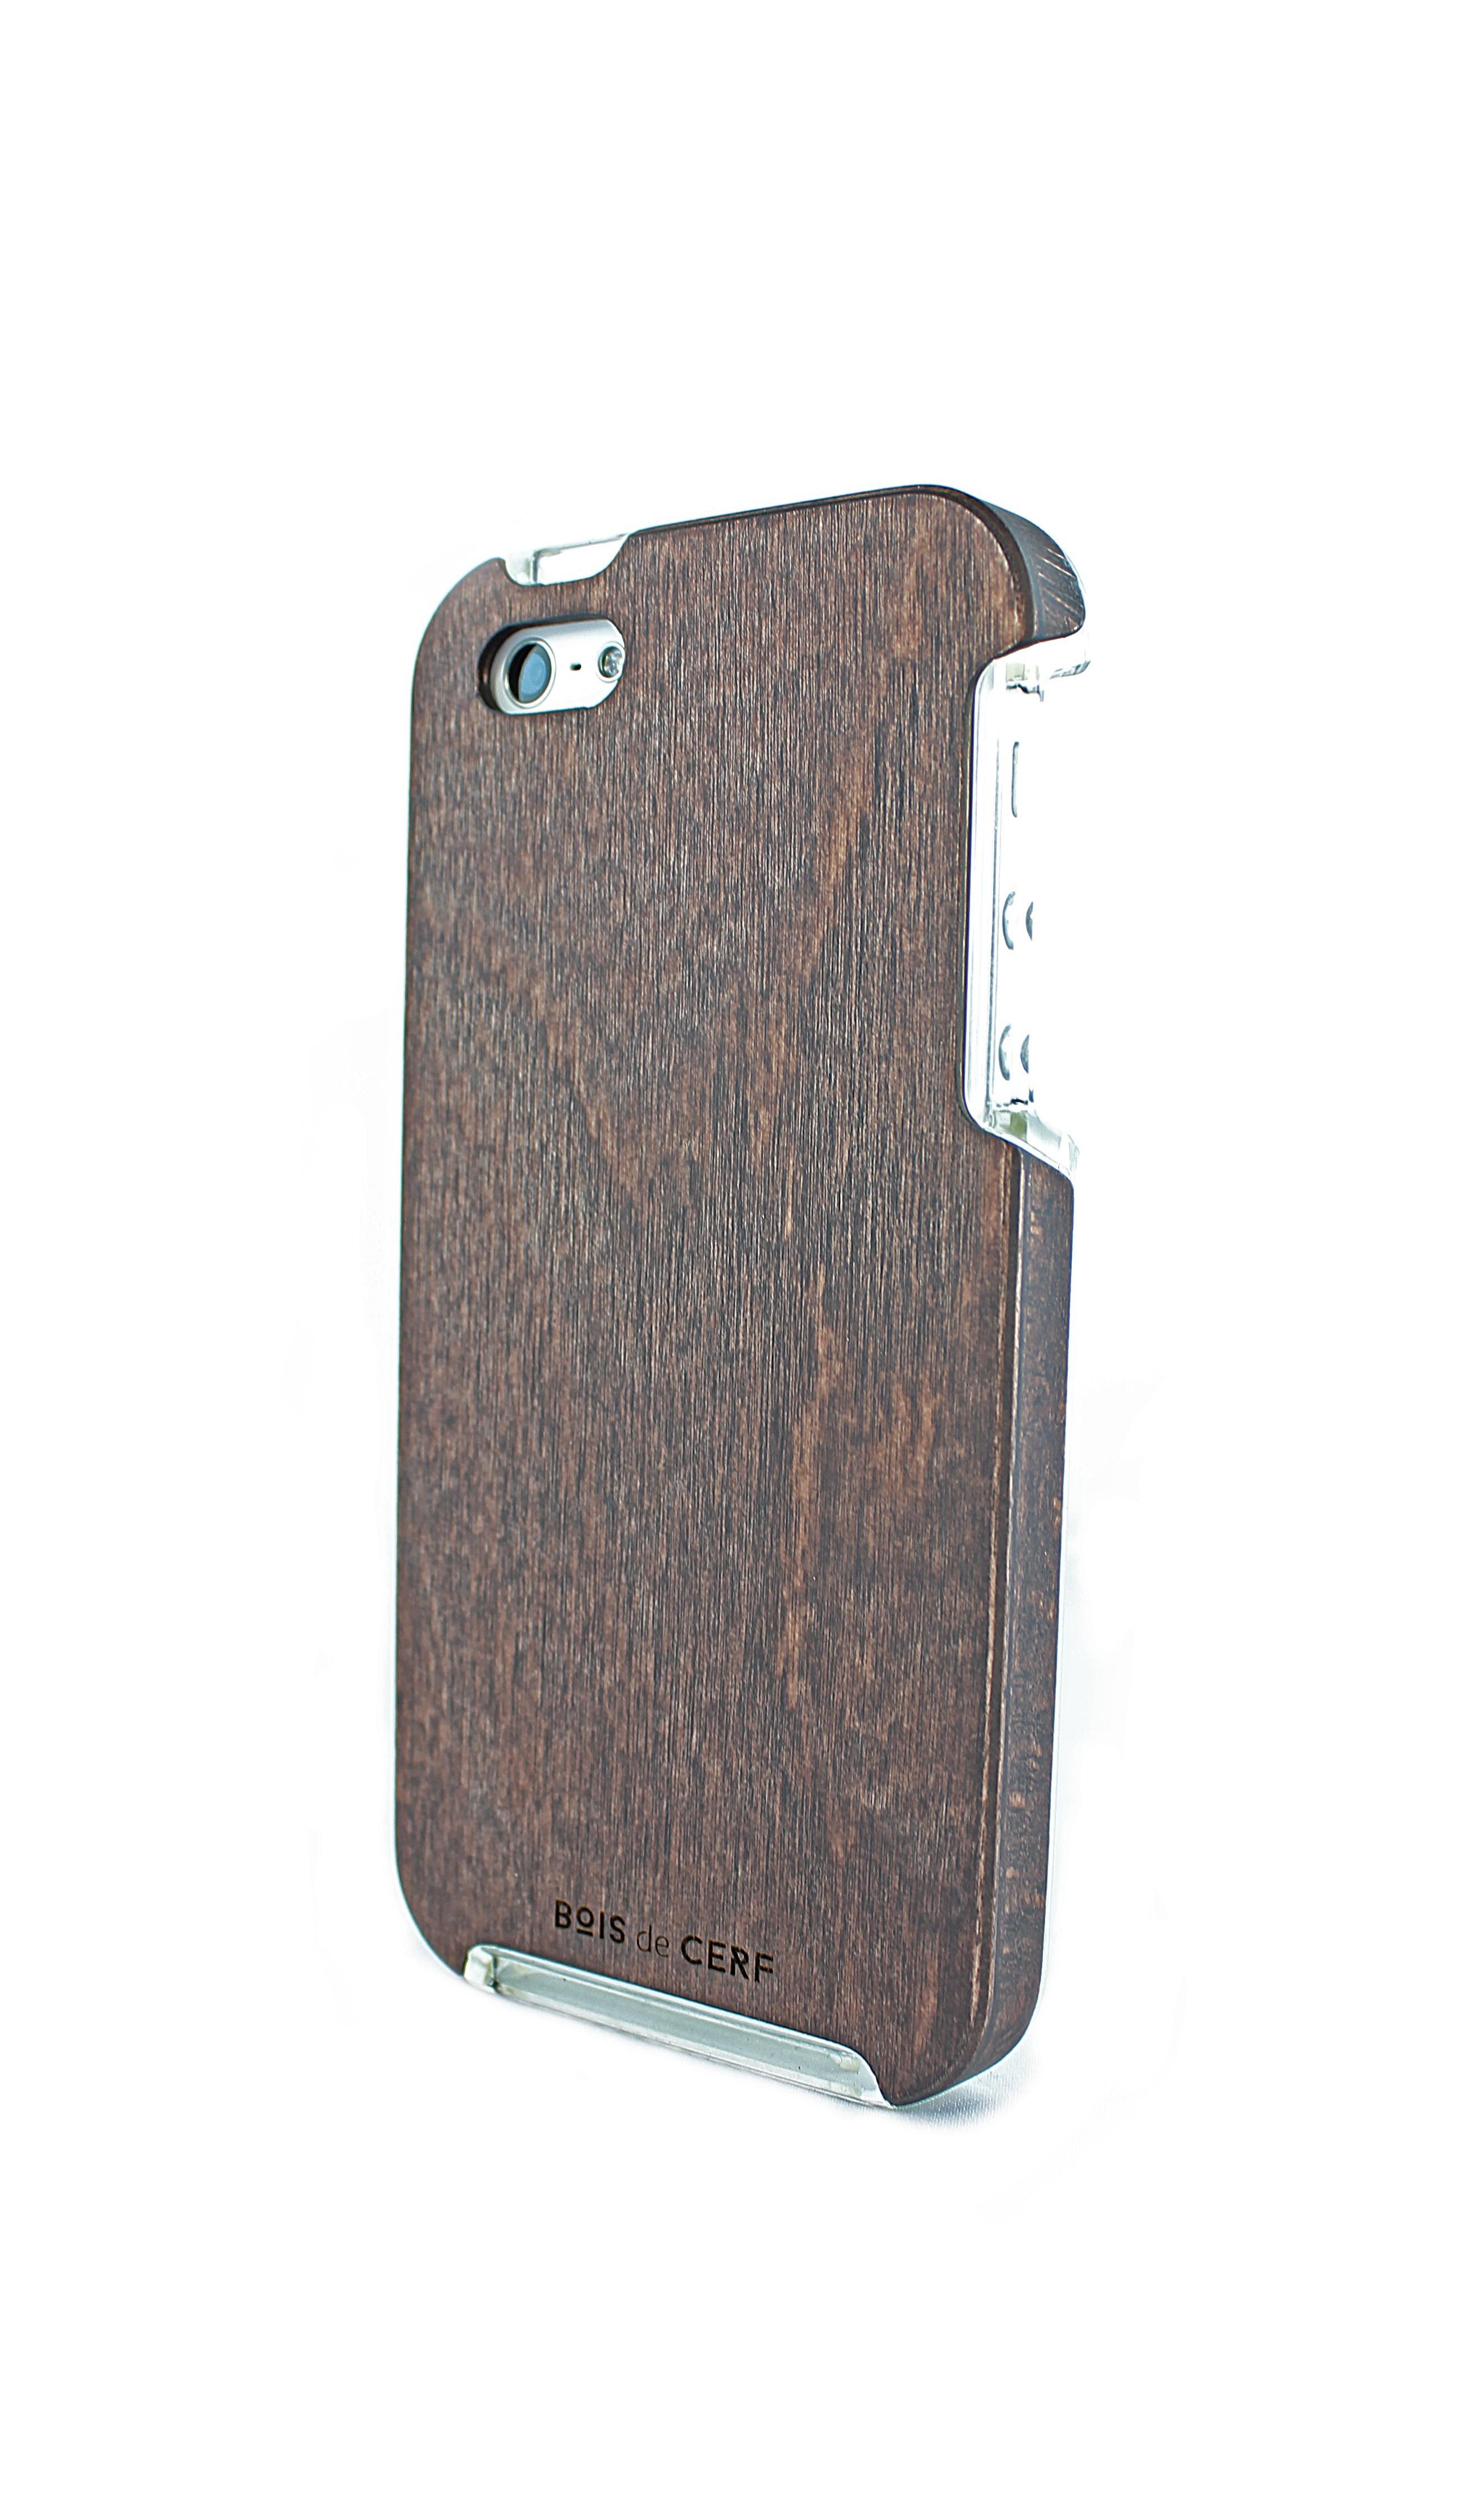 Brâme coque bois iPhone 5/5S - iPhone SE